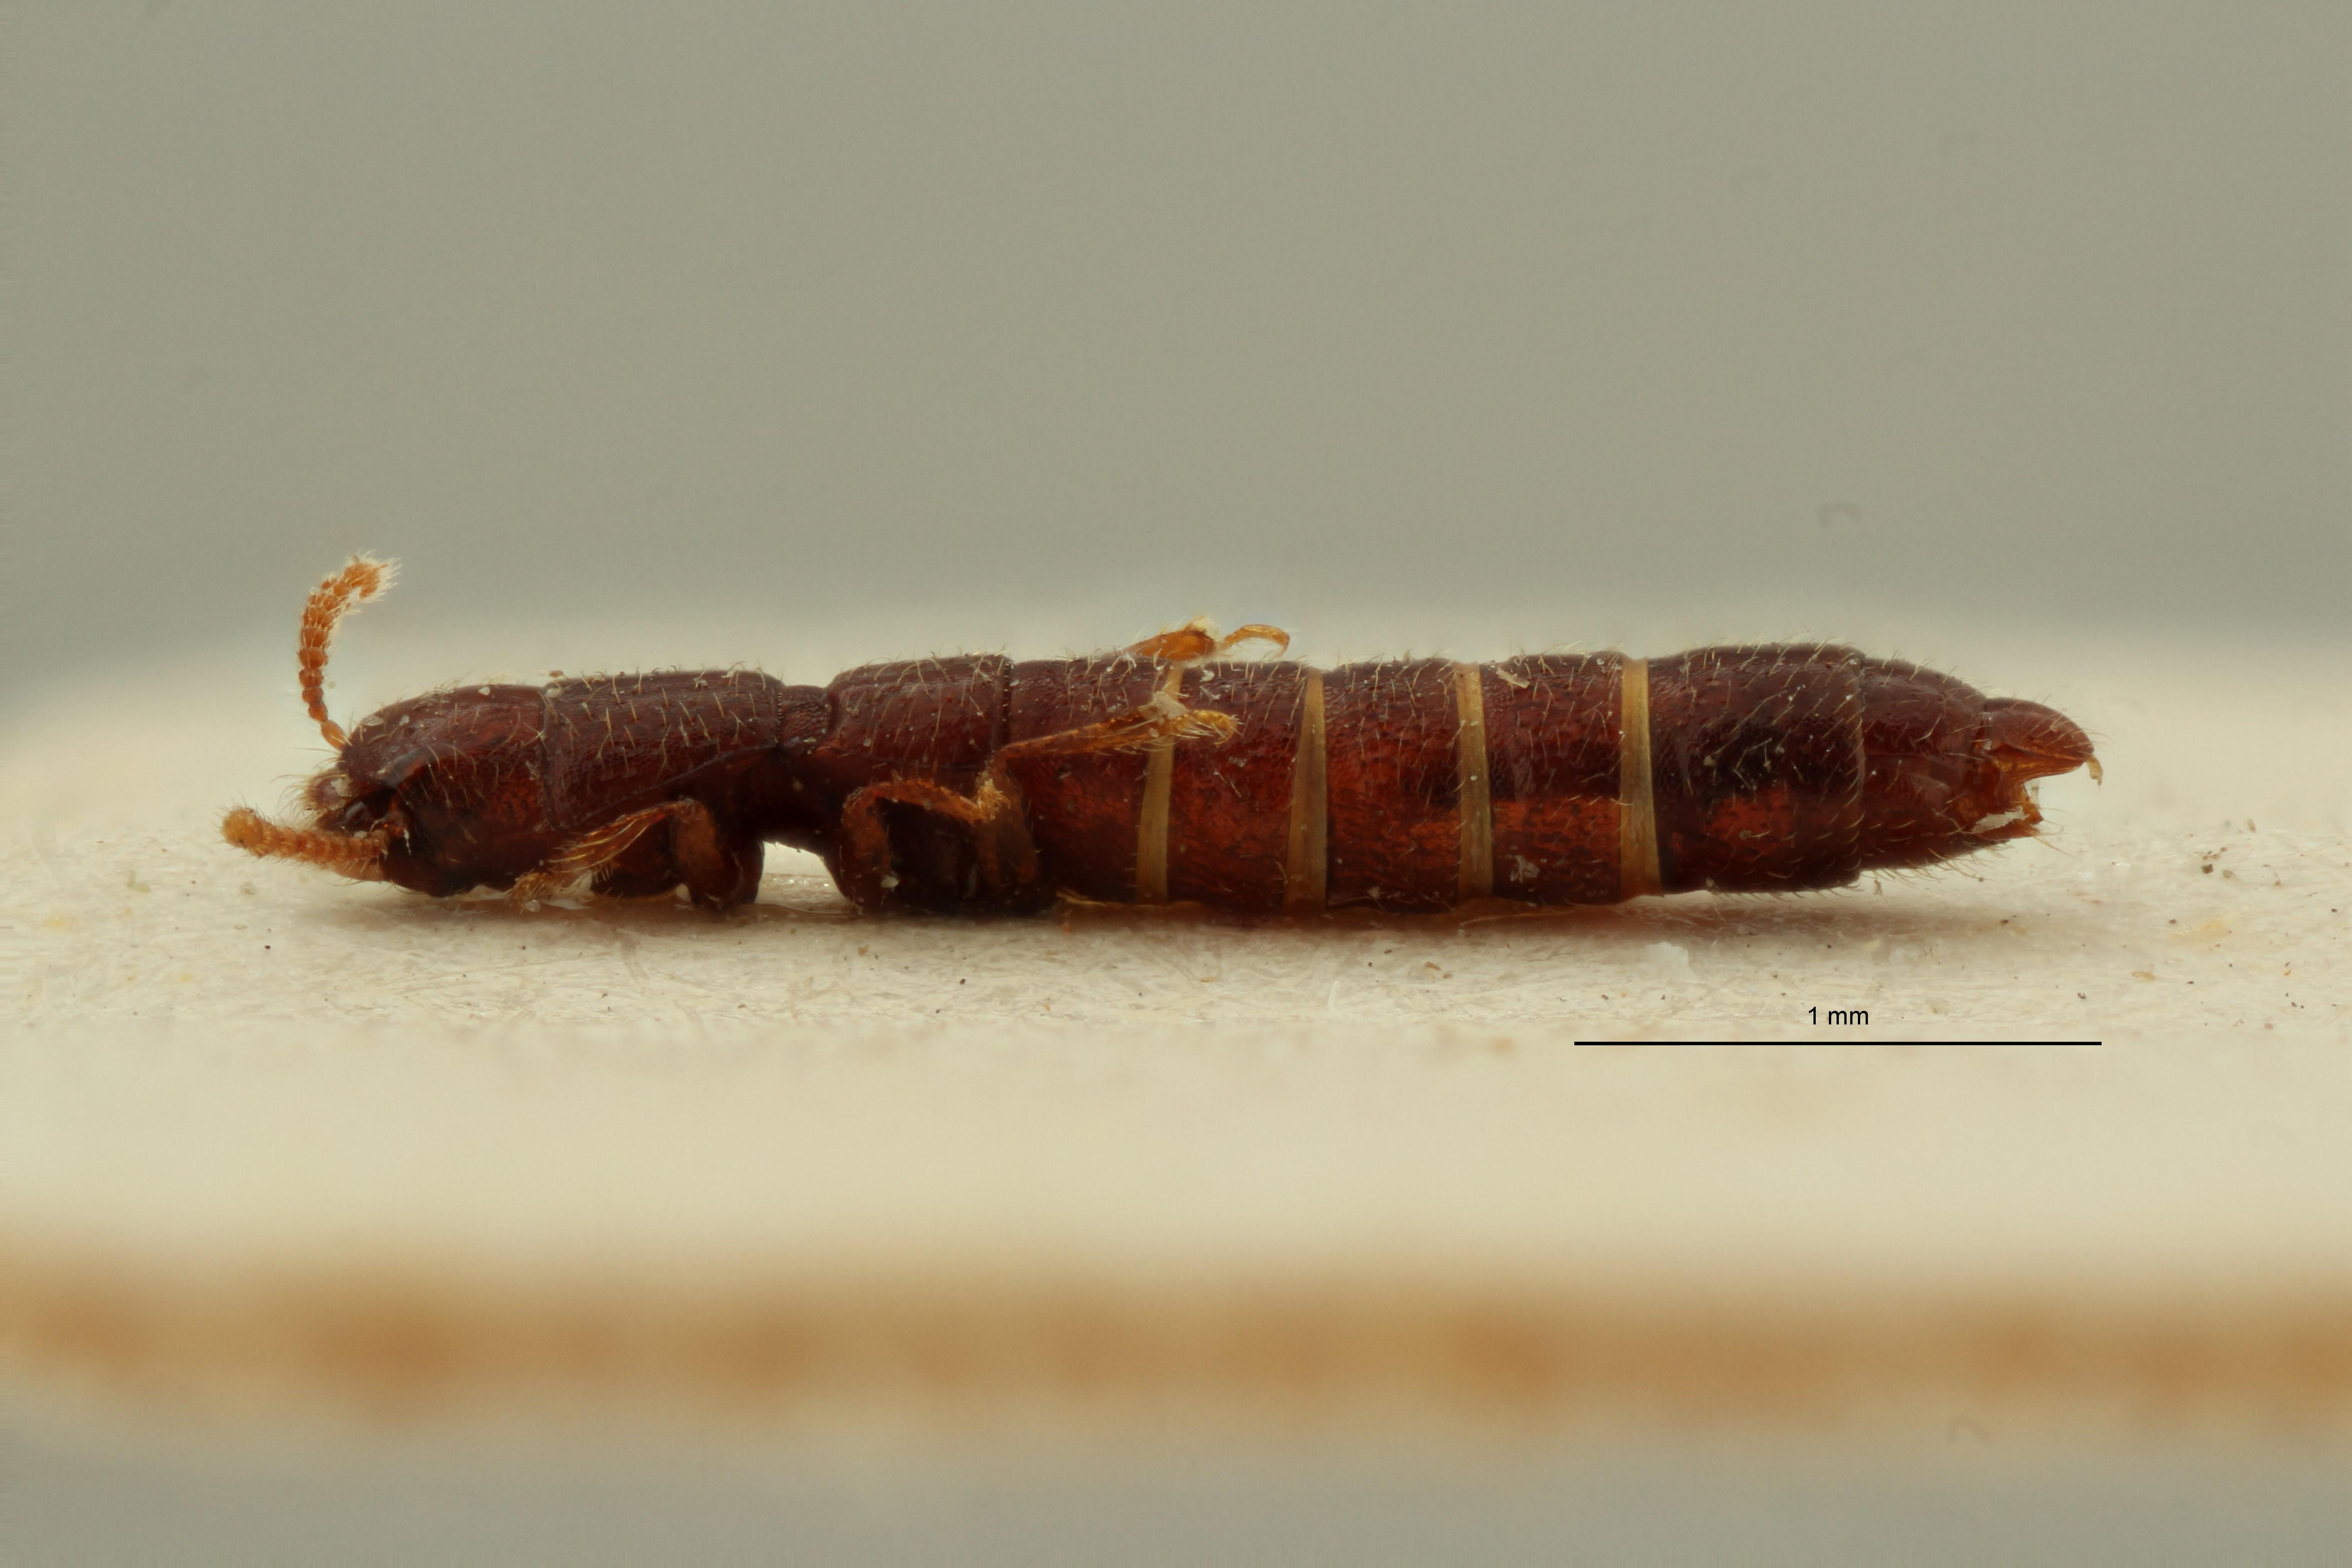 Afrotyphlopsis kivuensis pt L ZS PMax Scaled.jpeg